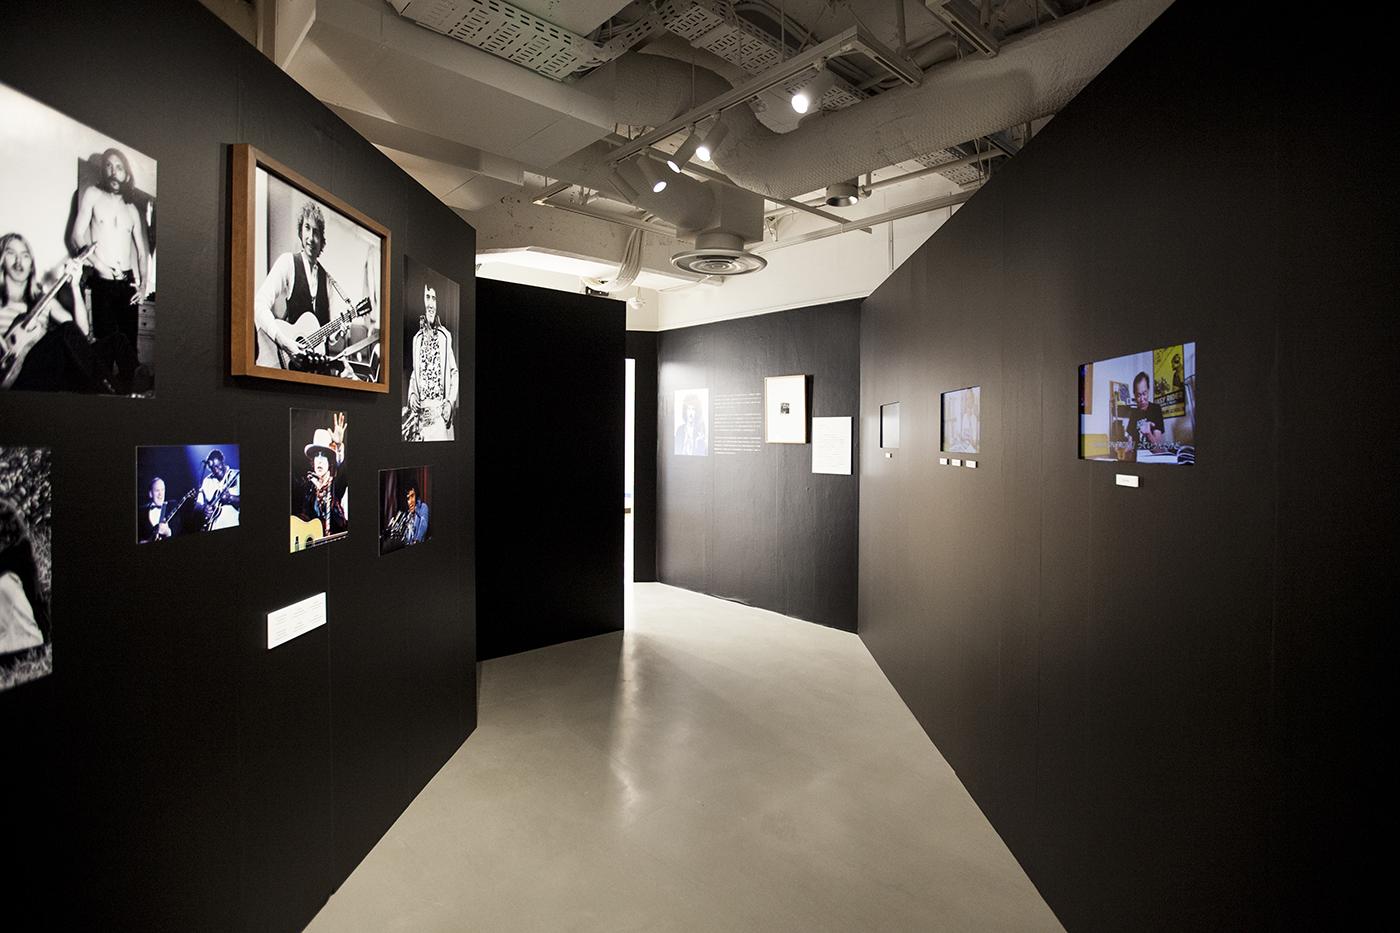 m-0049 【レポート】ロックの歴史が凝縮。フジロックファンも必見のボブ・グルーエン写真展